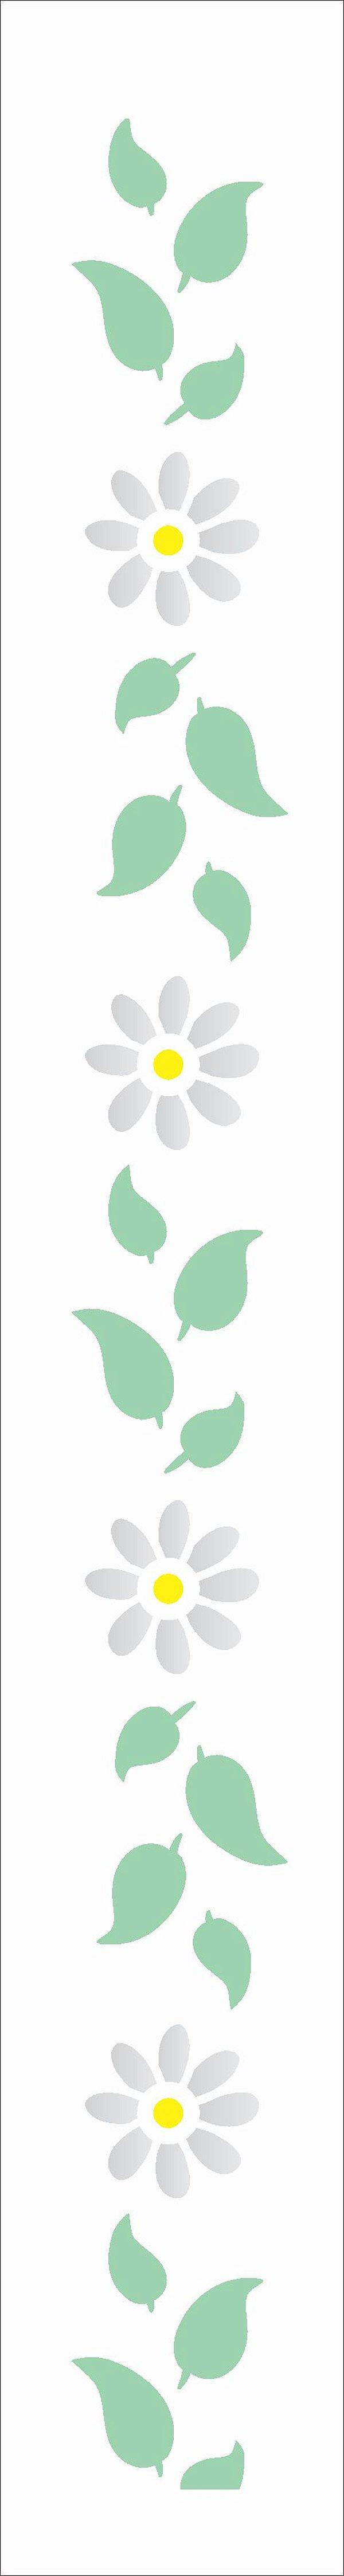 Stencil 4X30 Simples – Flores Margaridas III - OPA 3059